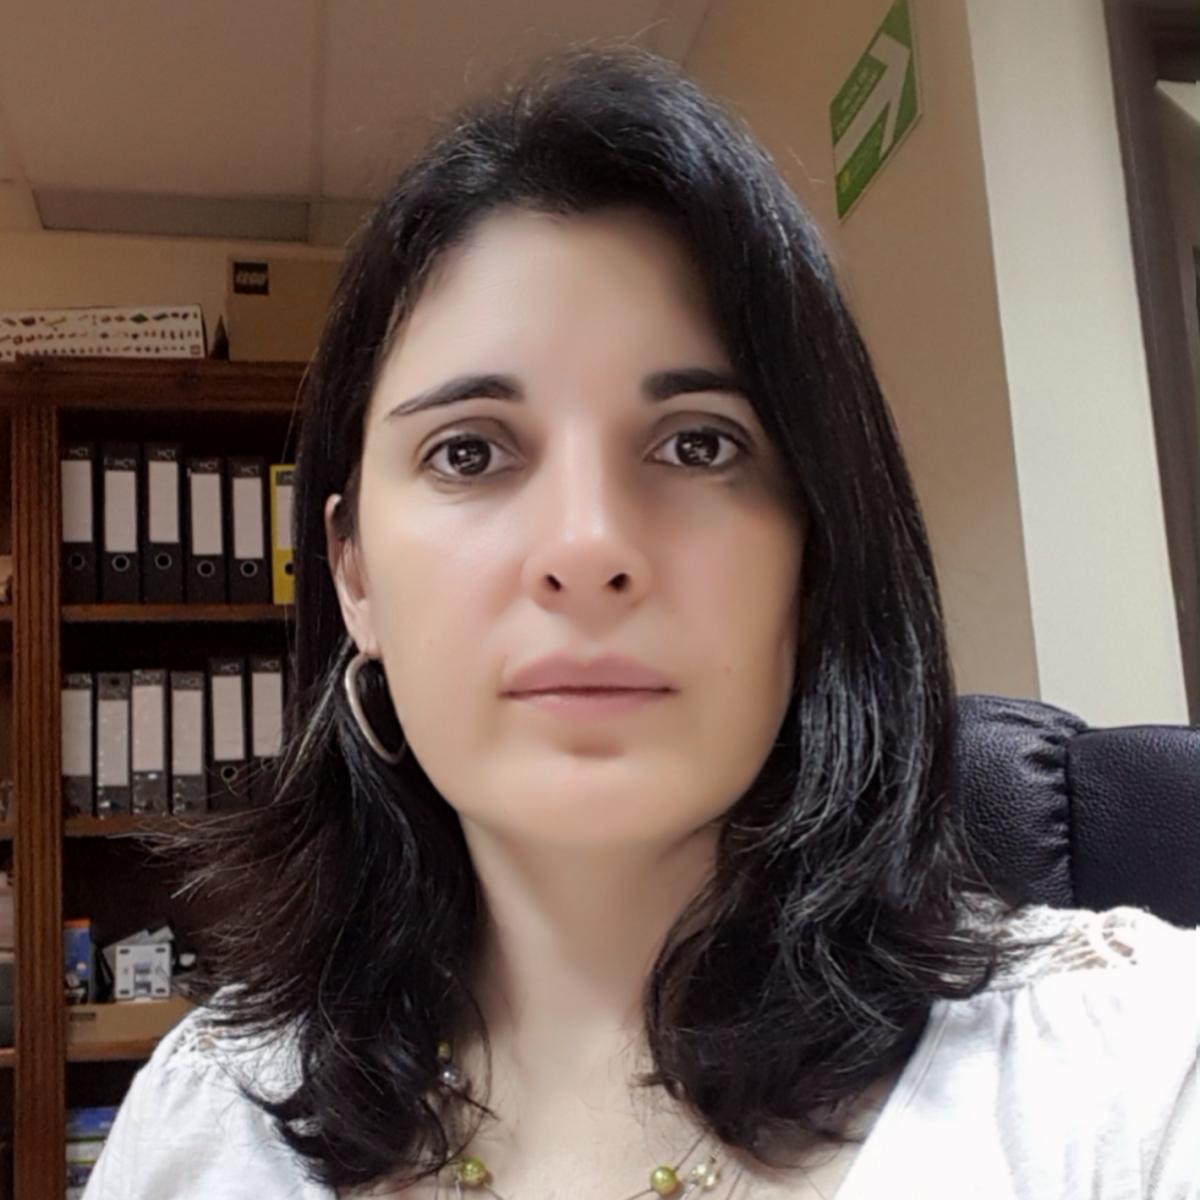 Michelle Marie Fontecha Sandoval